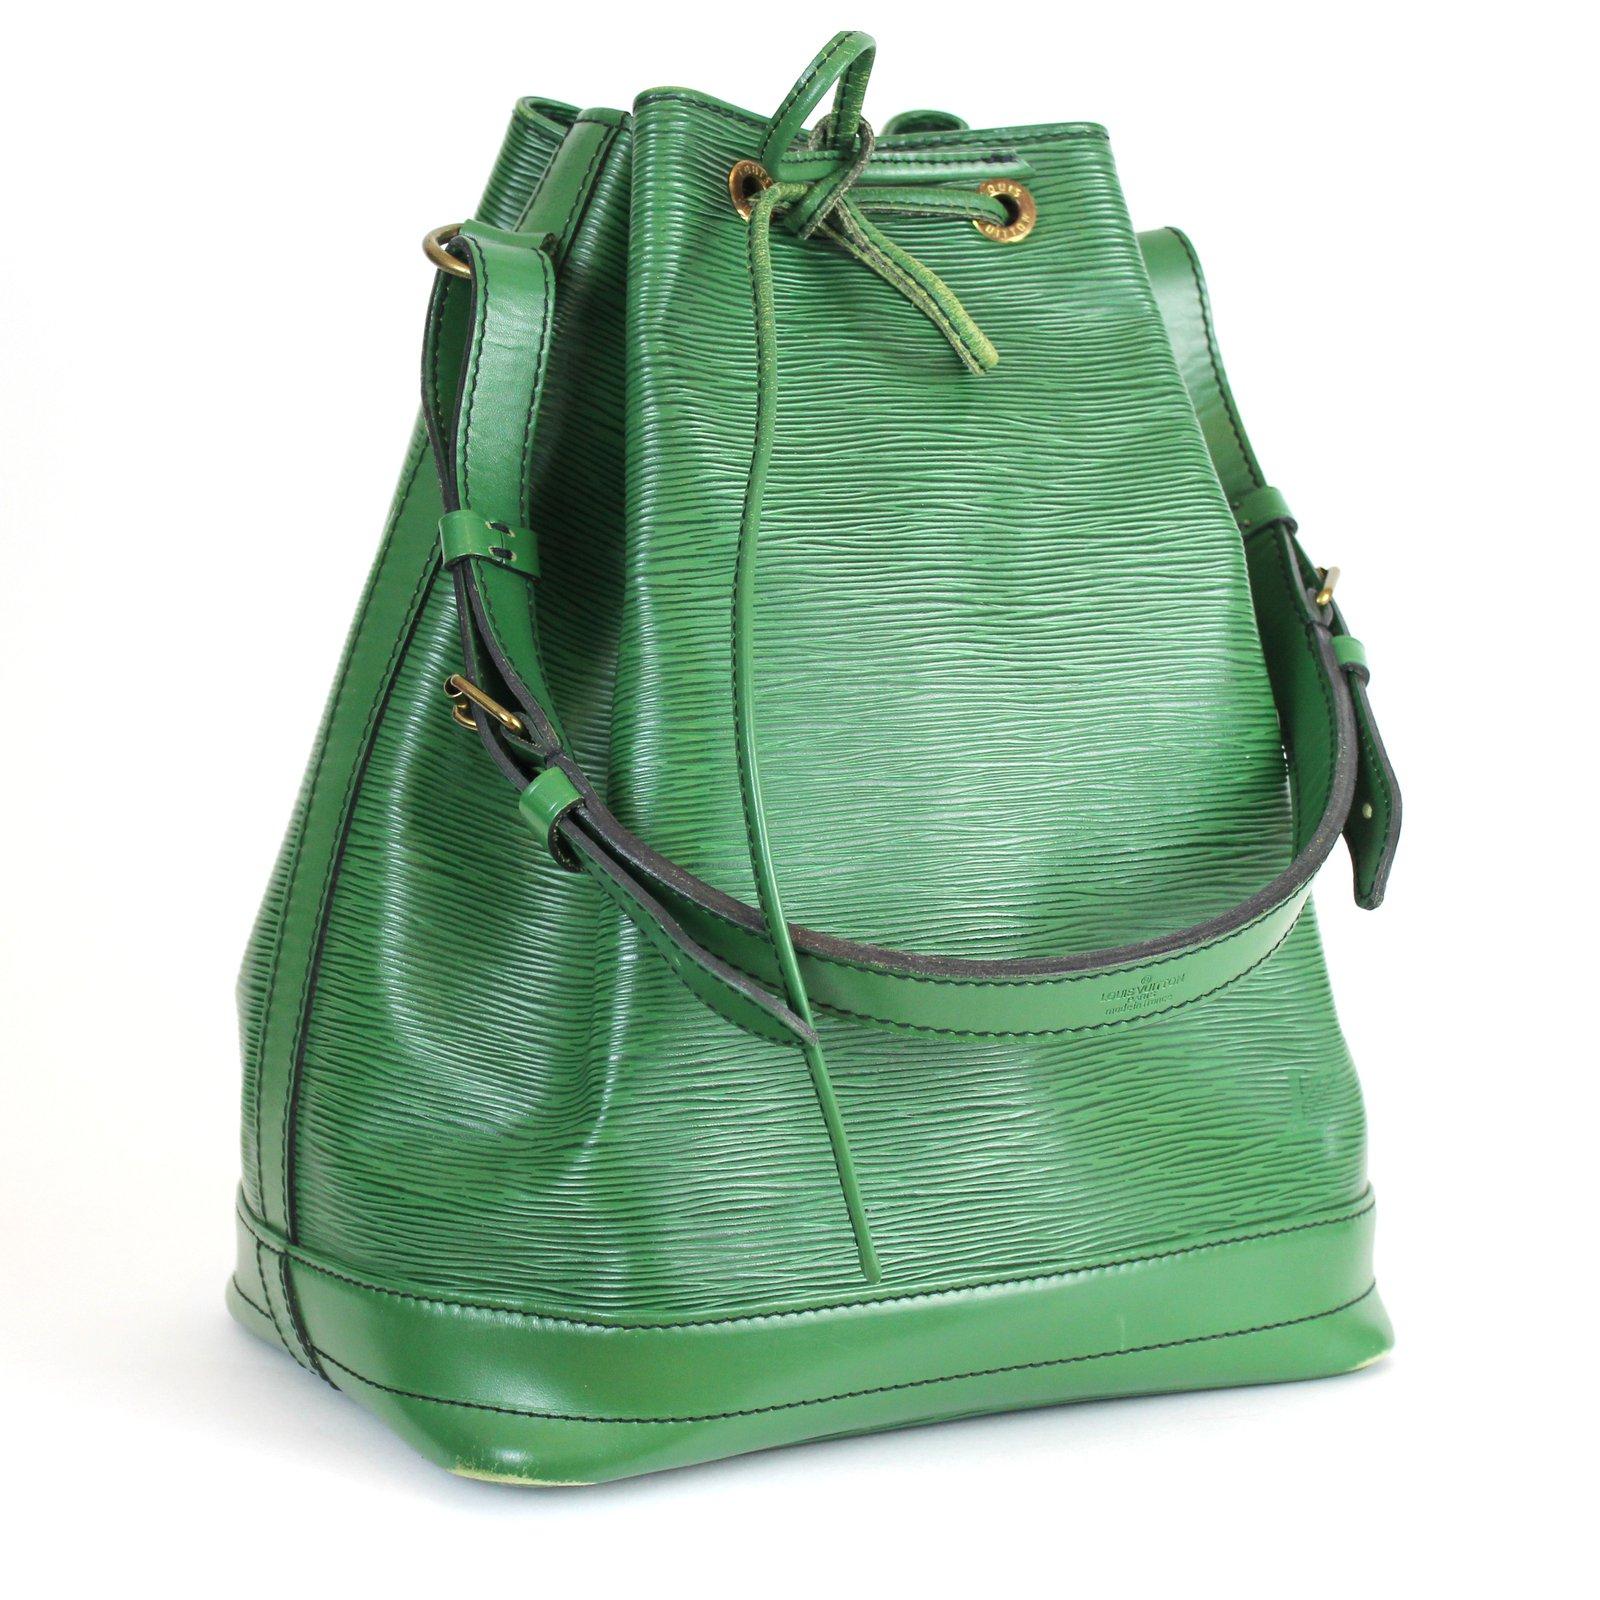 ede932fa87903 Sacs à main Louis Vuitton sac Noé GM Cuir Vert ref.5226 - Joli Closet